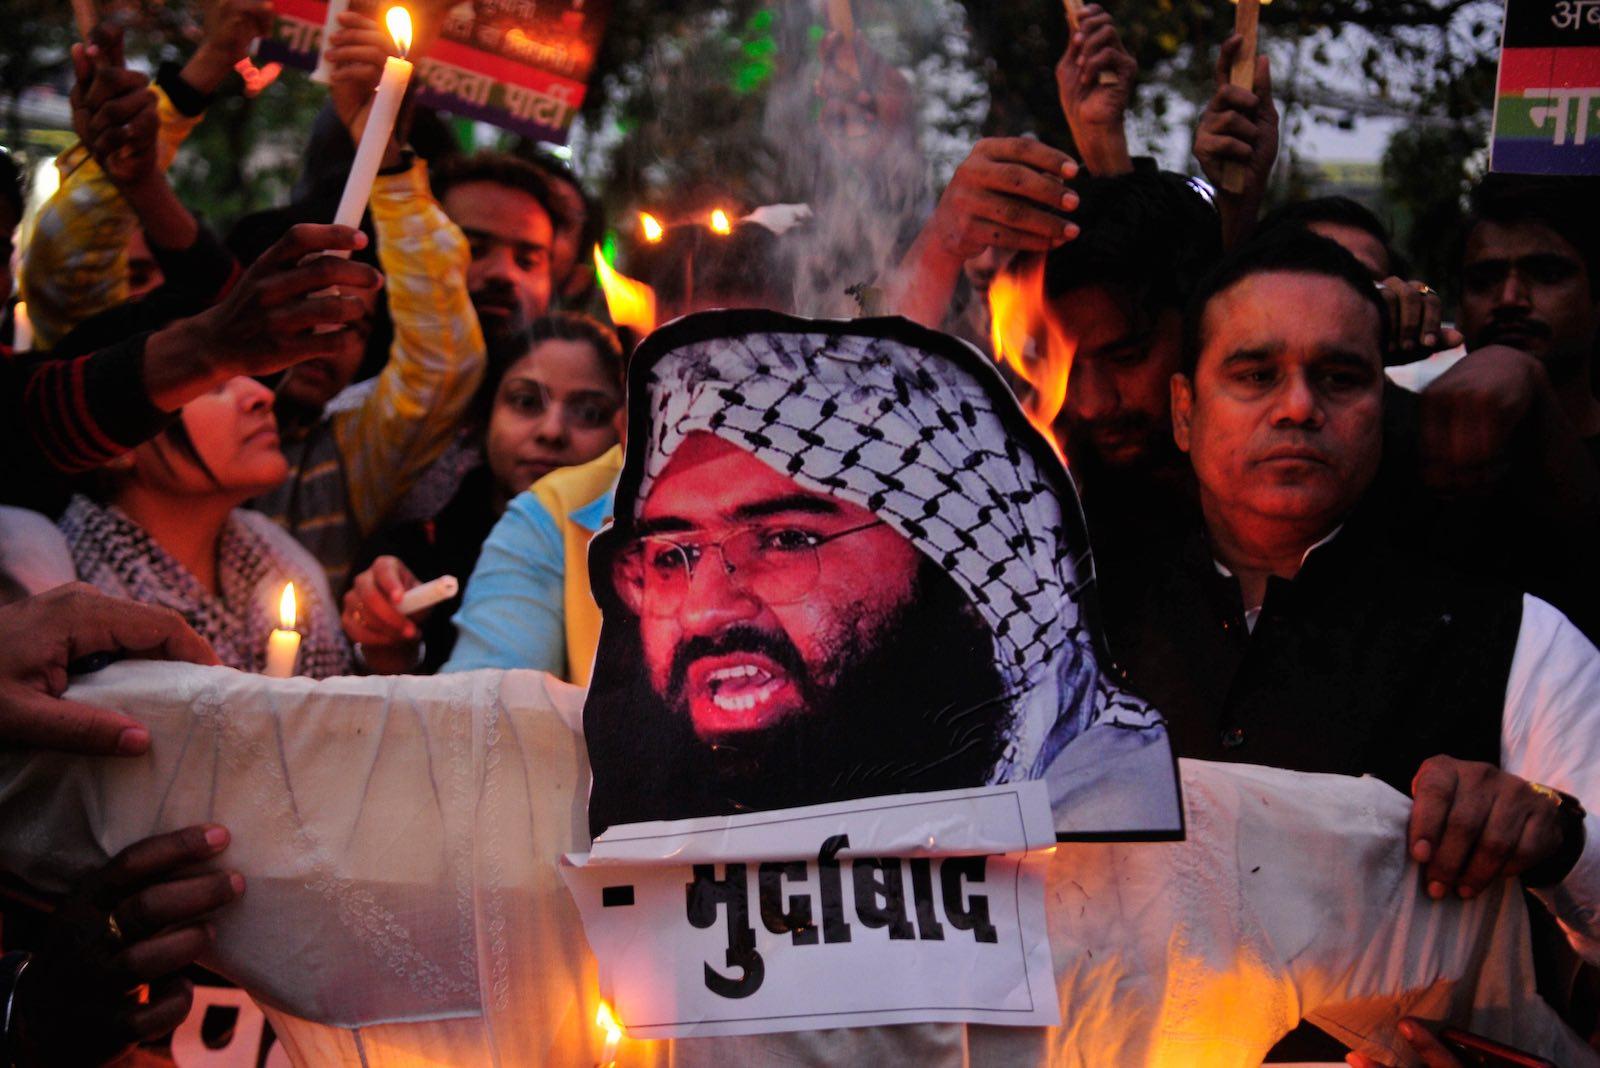 Demonstrators in India burn an effigy of Jaish-e-Mohammed leader Masood Azhar in February (Photo: Deepak Gupta via Getty)